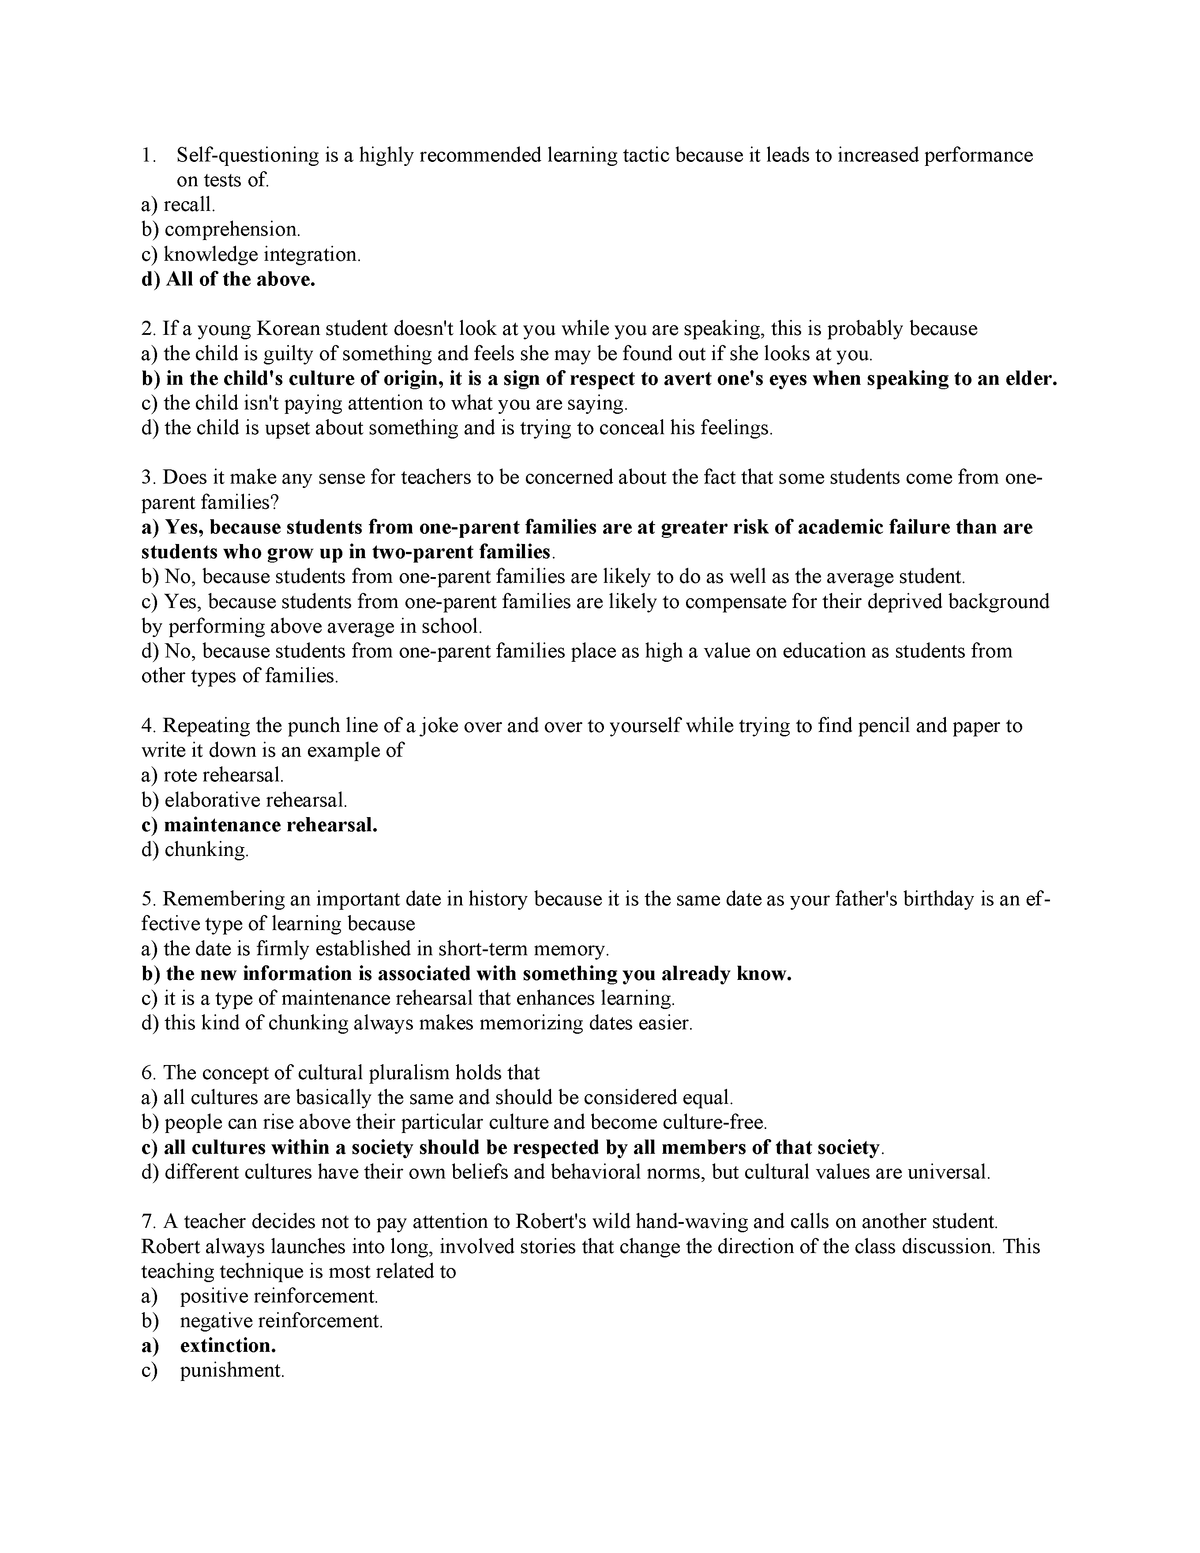 Exam 2018 - 3300: Educational Psychology - StuDocu